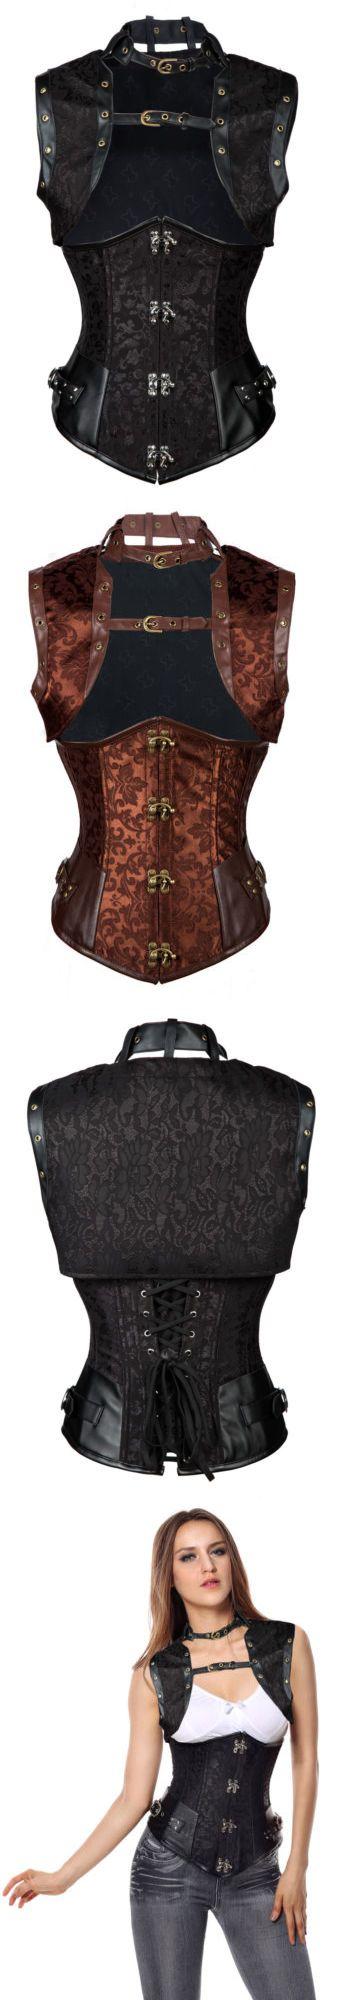 Sexy Lingerie: Steampunk Retro Steel Boned Waist Cincher Underbust Corset With Jacket Plus Size -> BUY IT NOW ONLY: $35.09 on eBay!